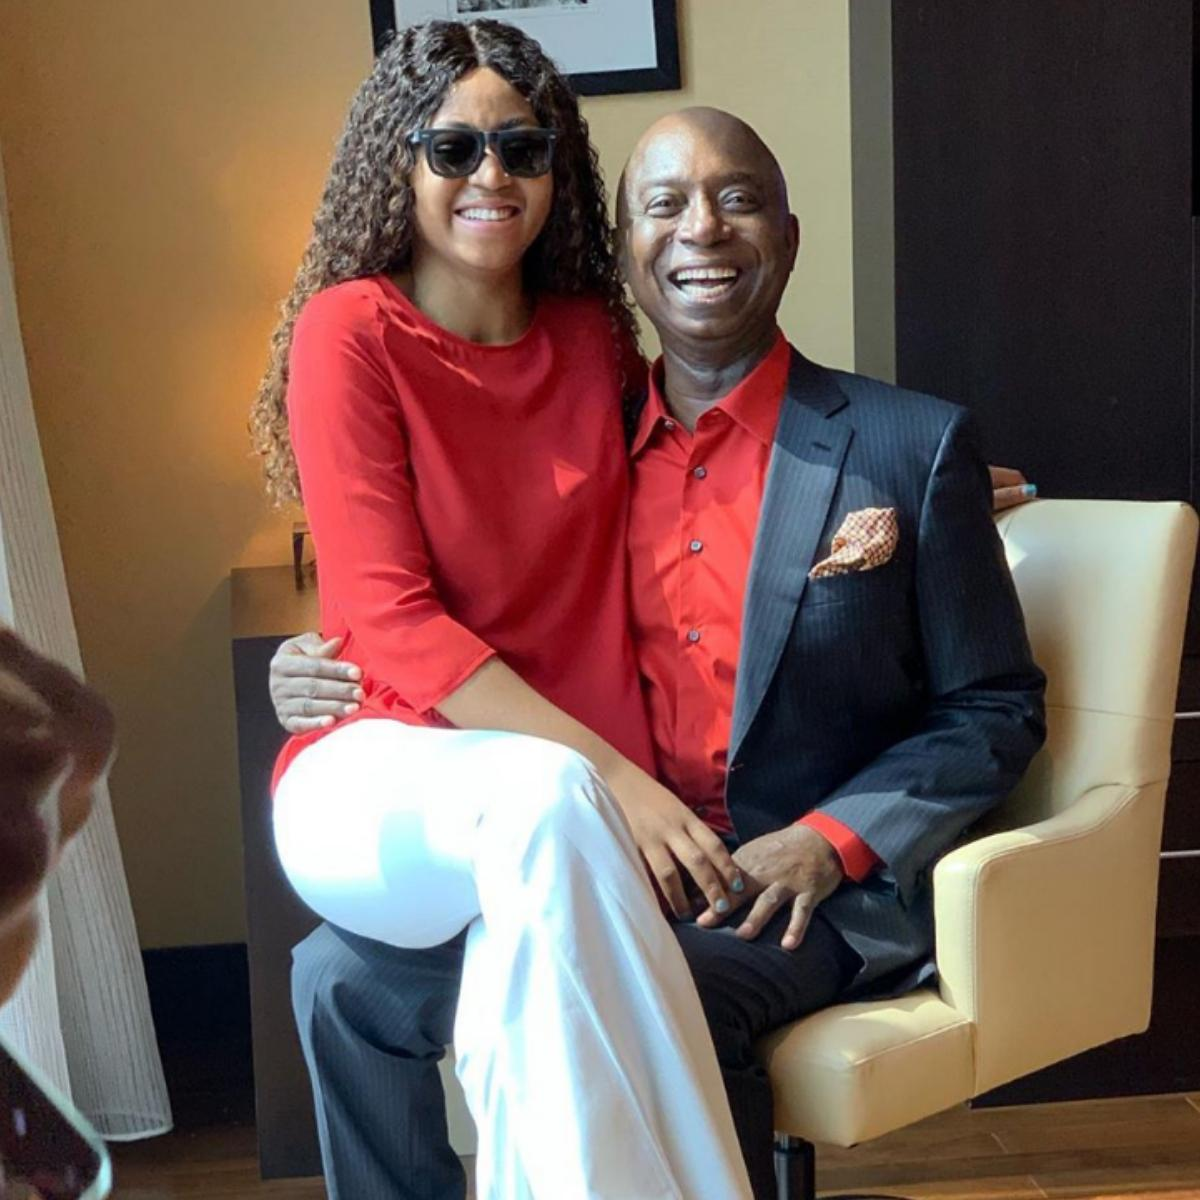 Regina Daniels Husband Celebrates A Goal